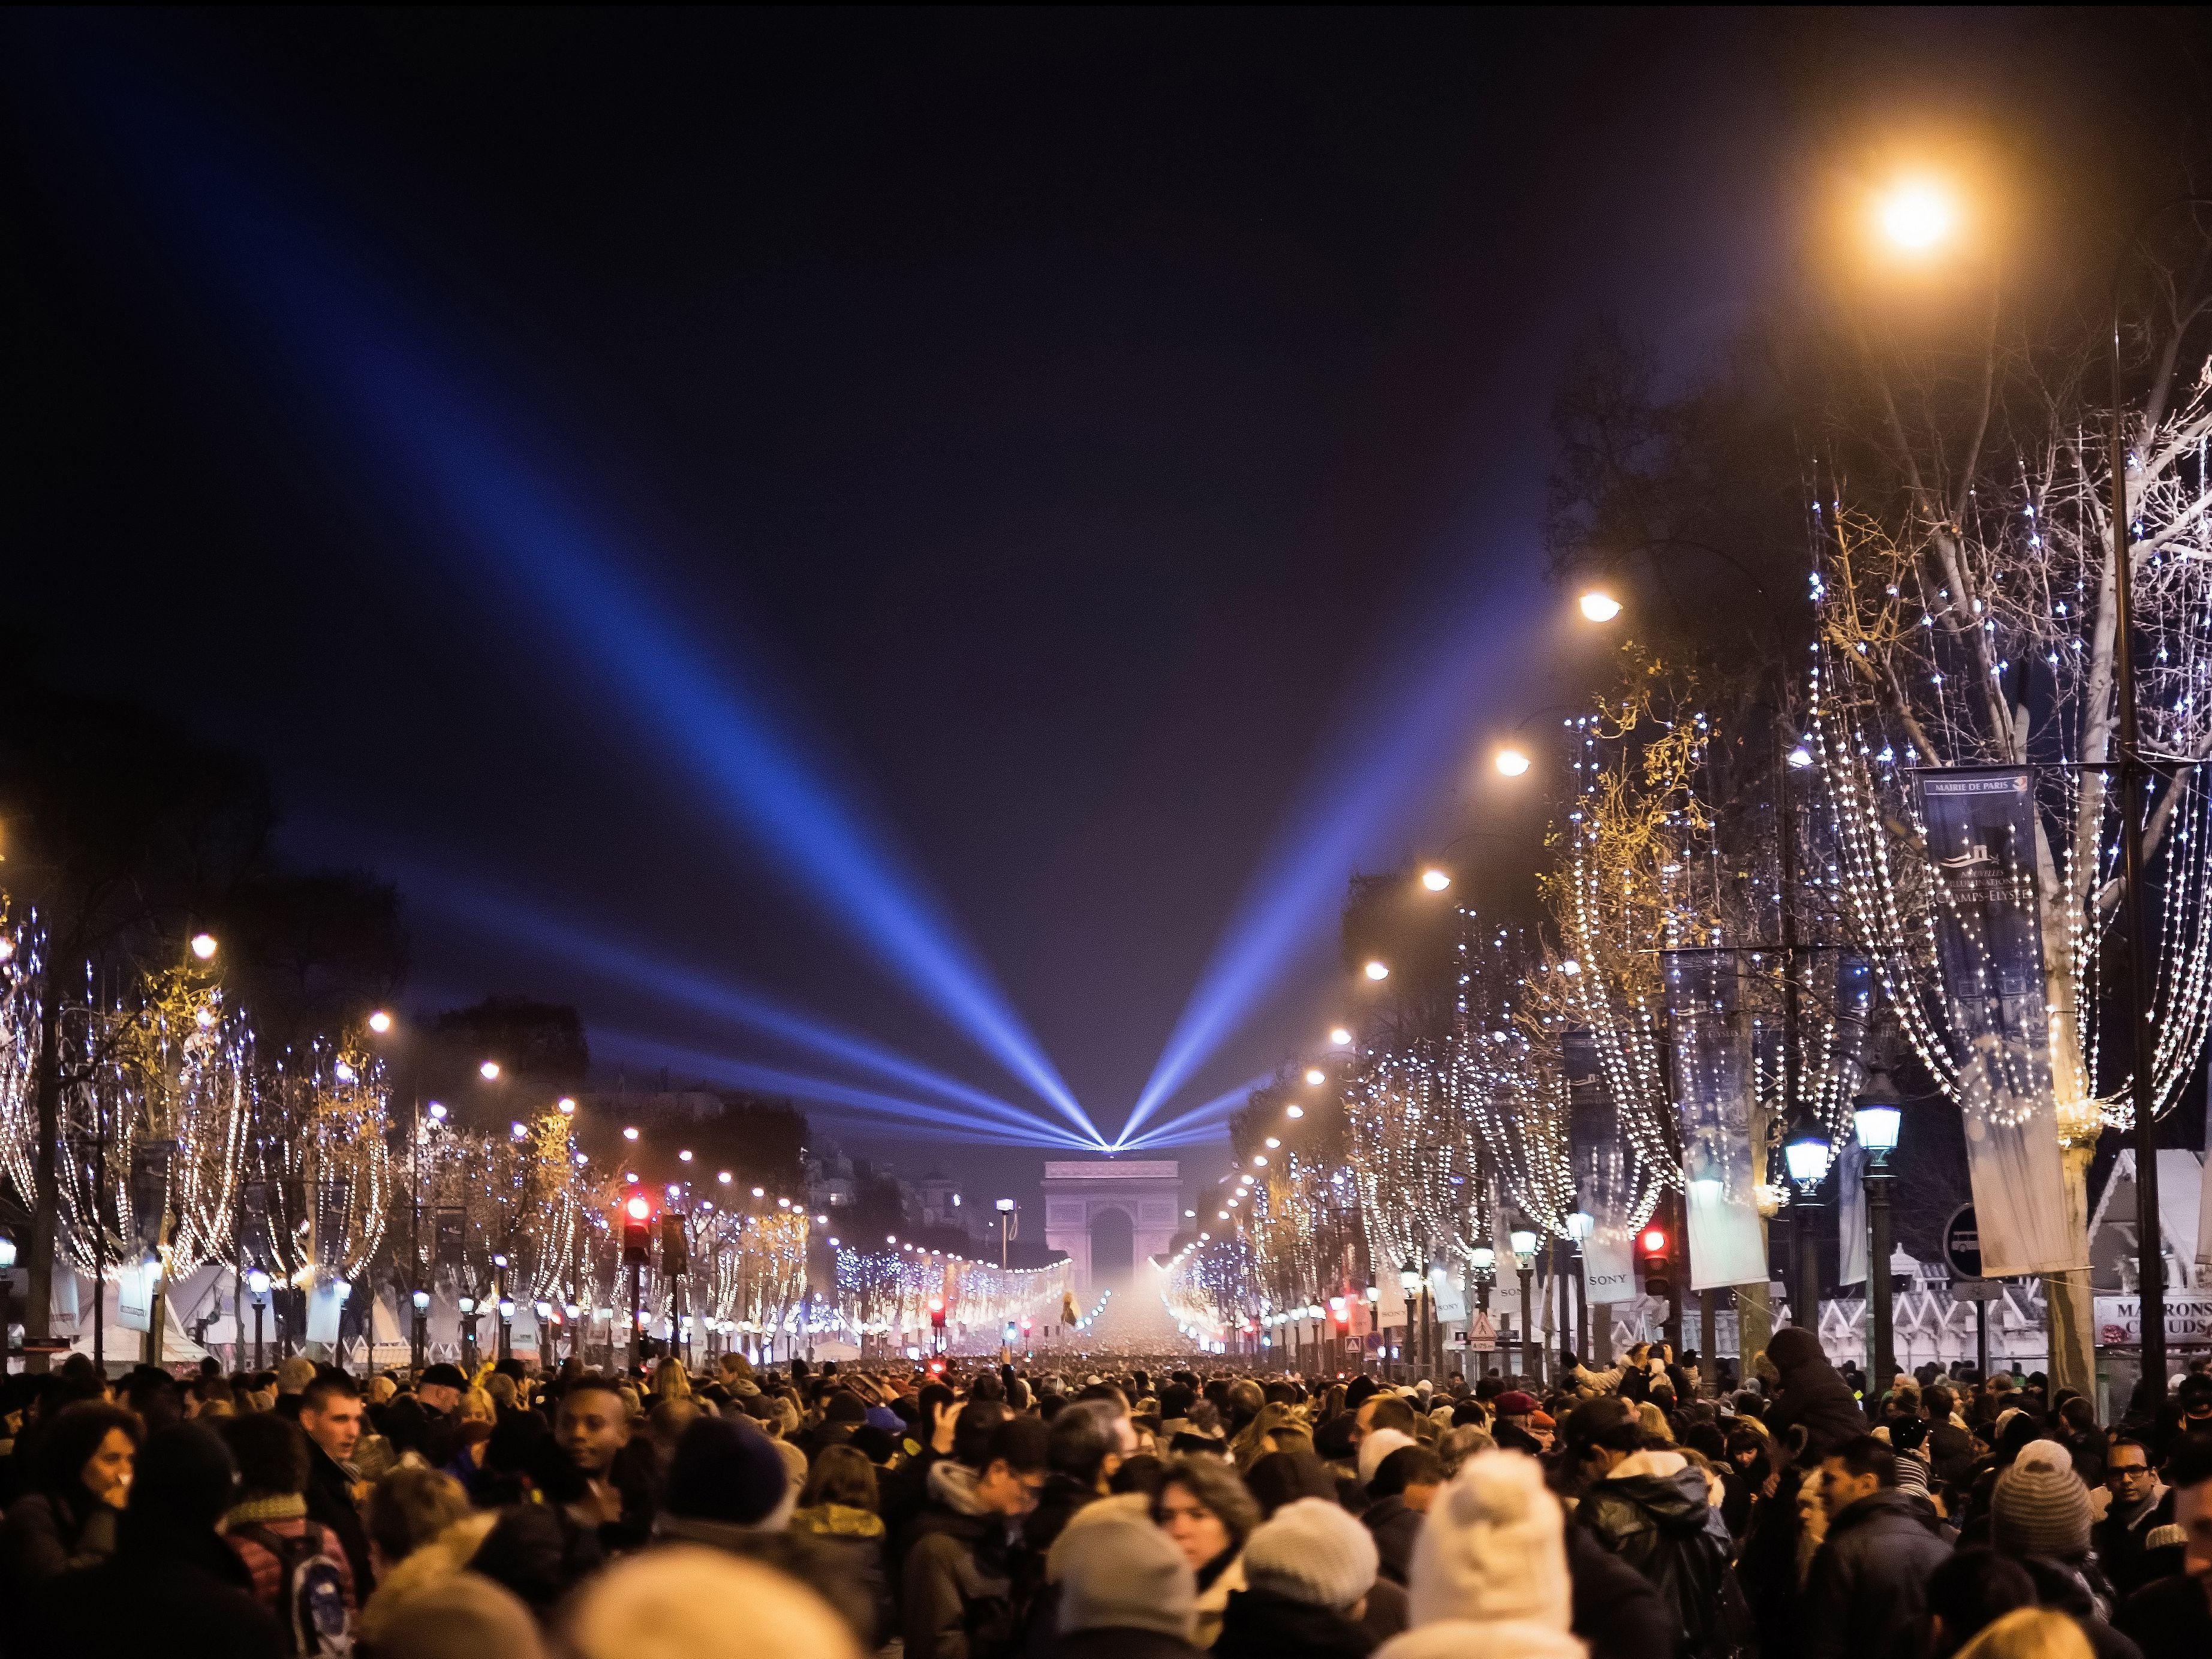 8 Ways to Celebrate New Year's in Paris